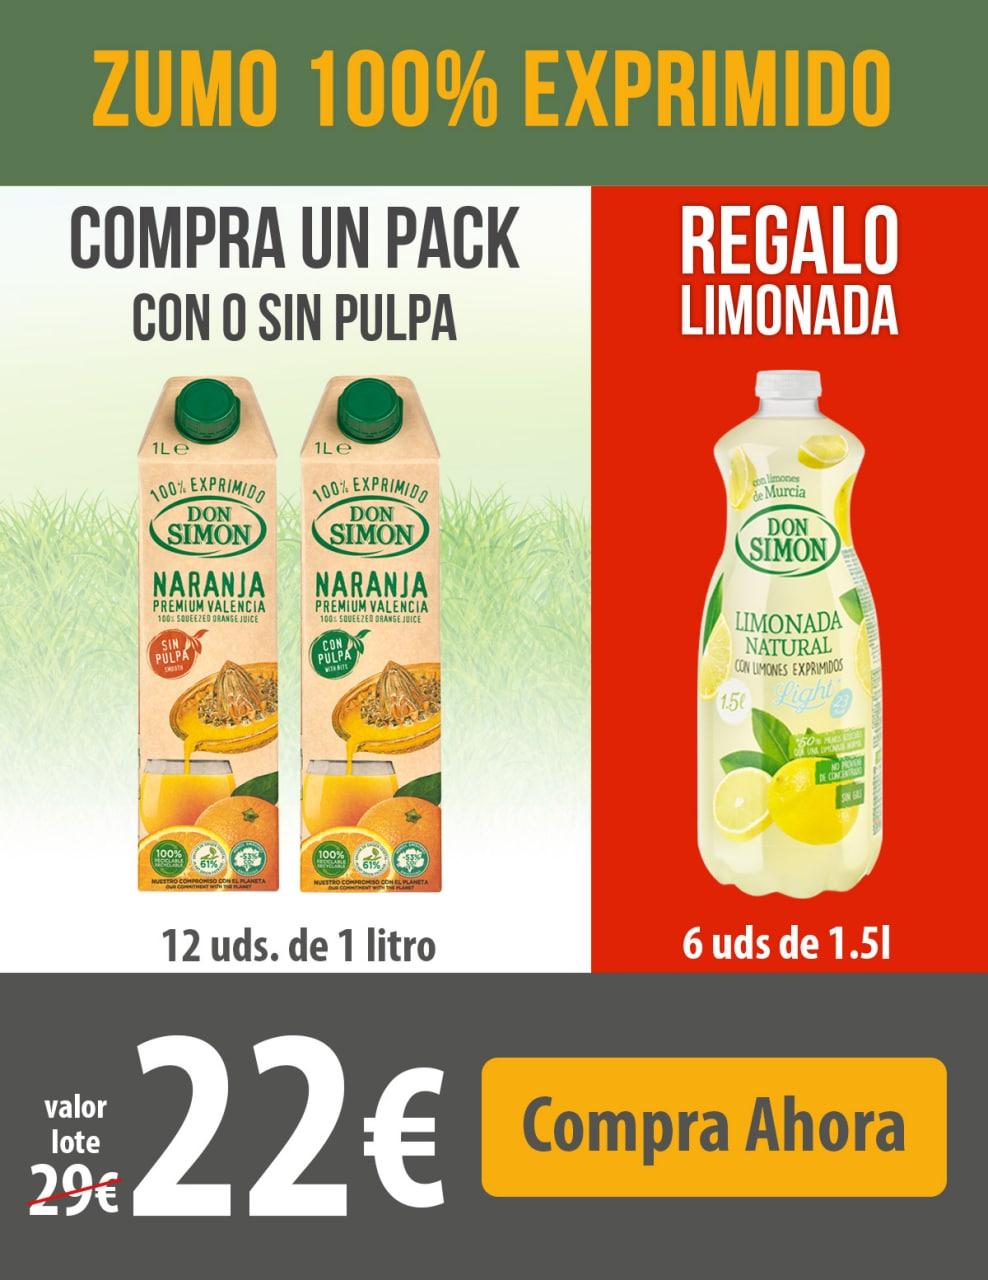 12x1L Zumo Naranja (con o sin pulpa) + 6x1,5L Limonada de Regalo + envío gratis